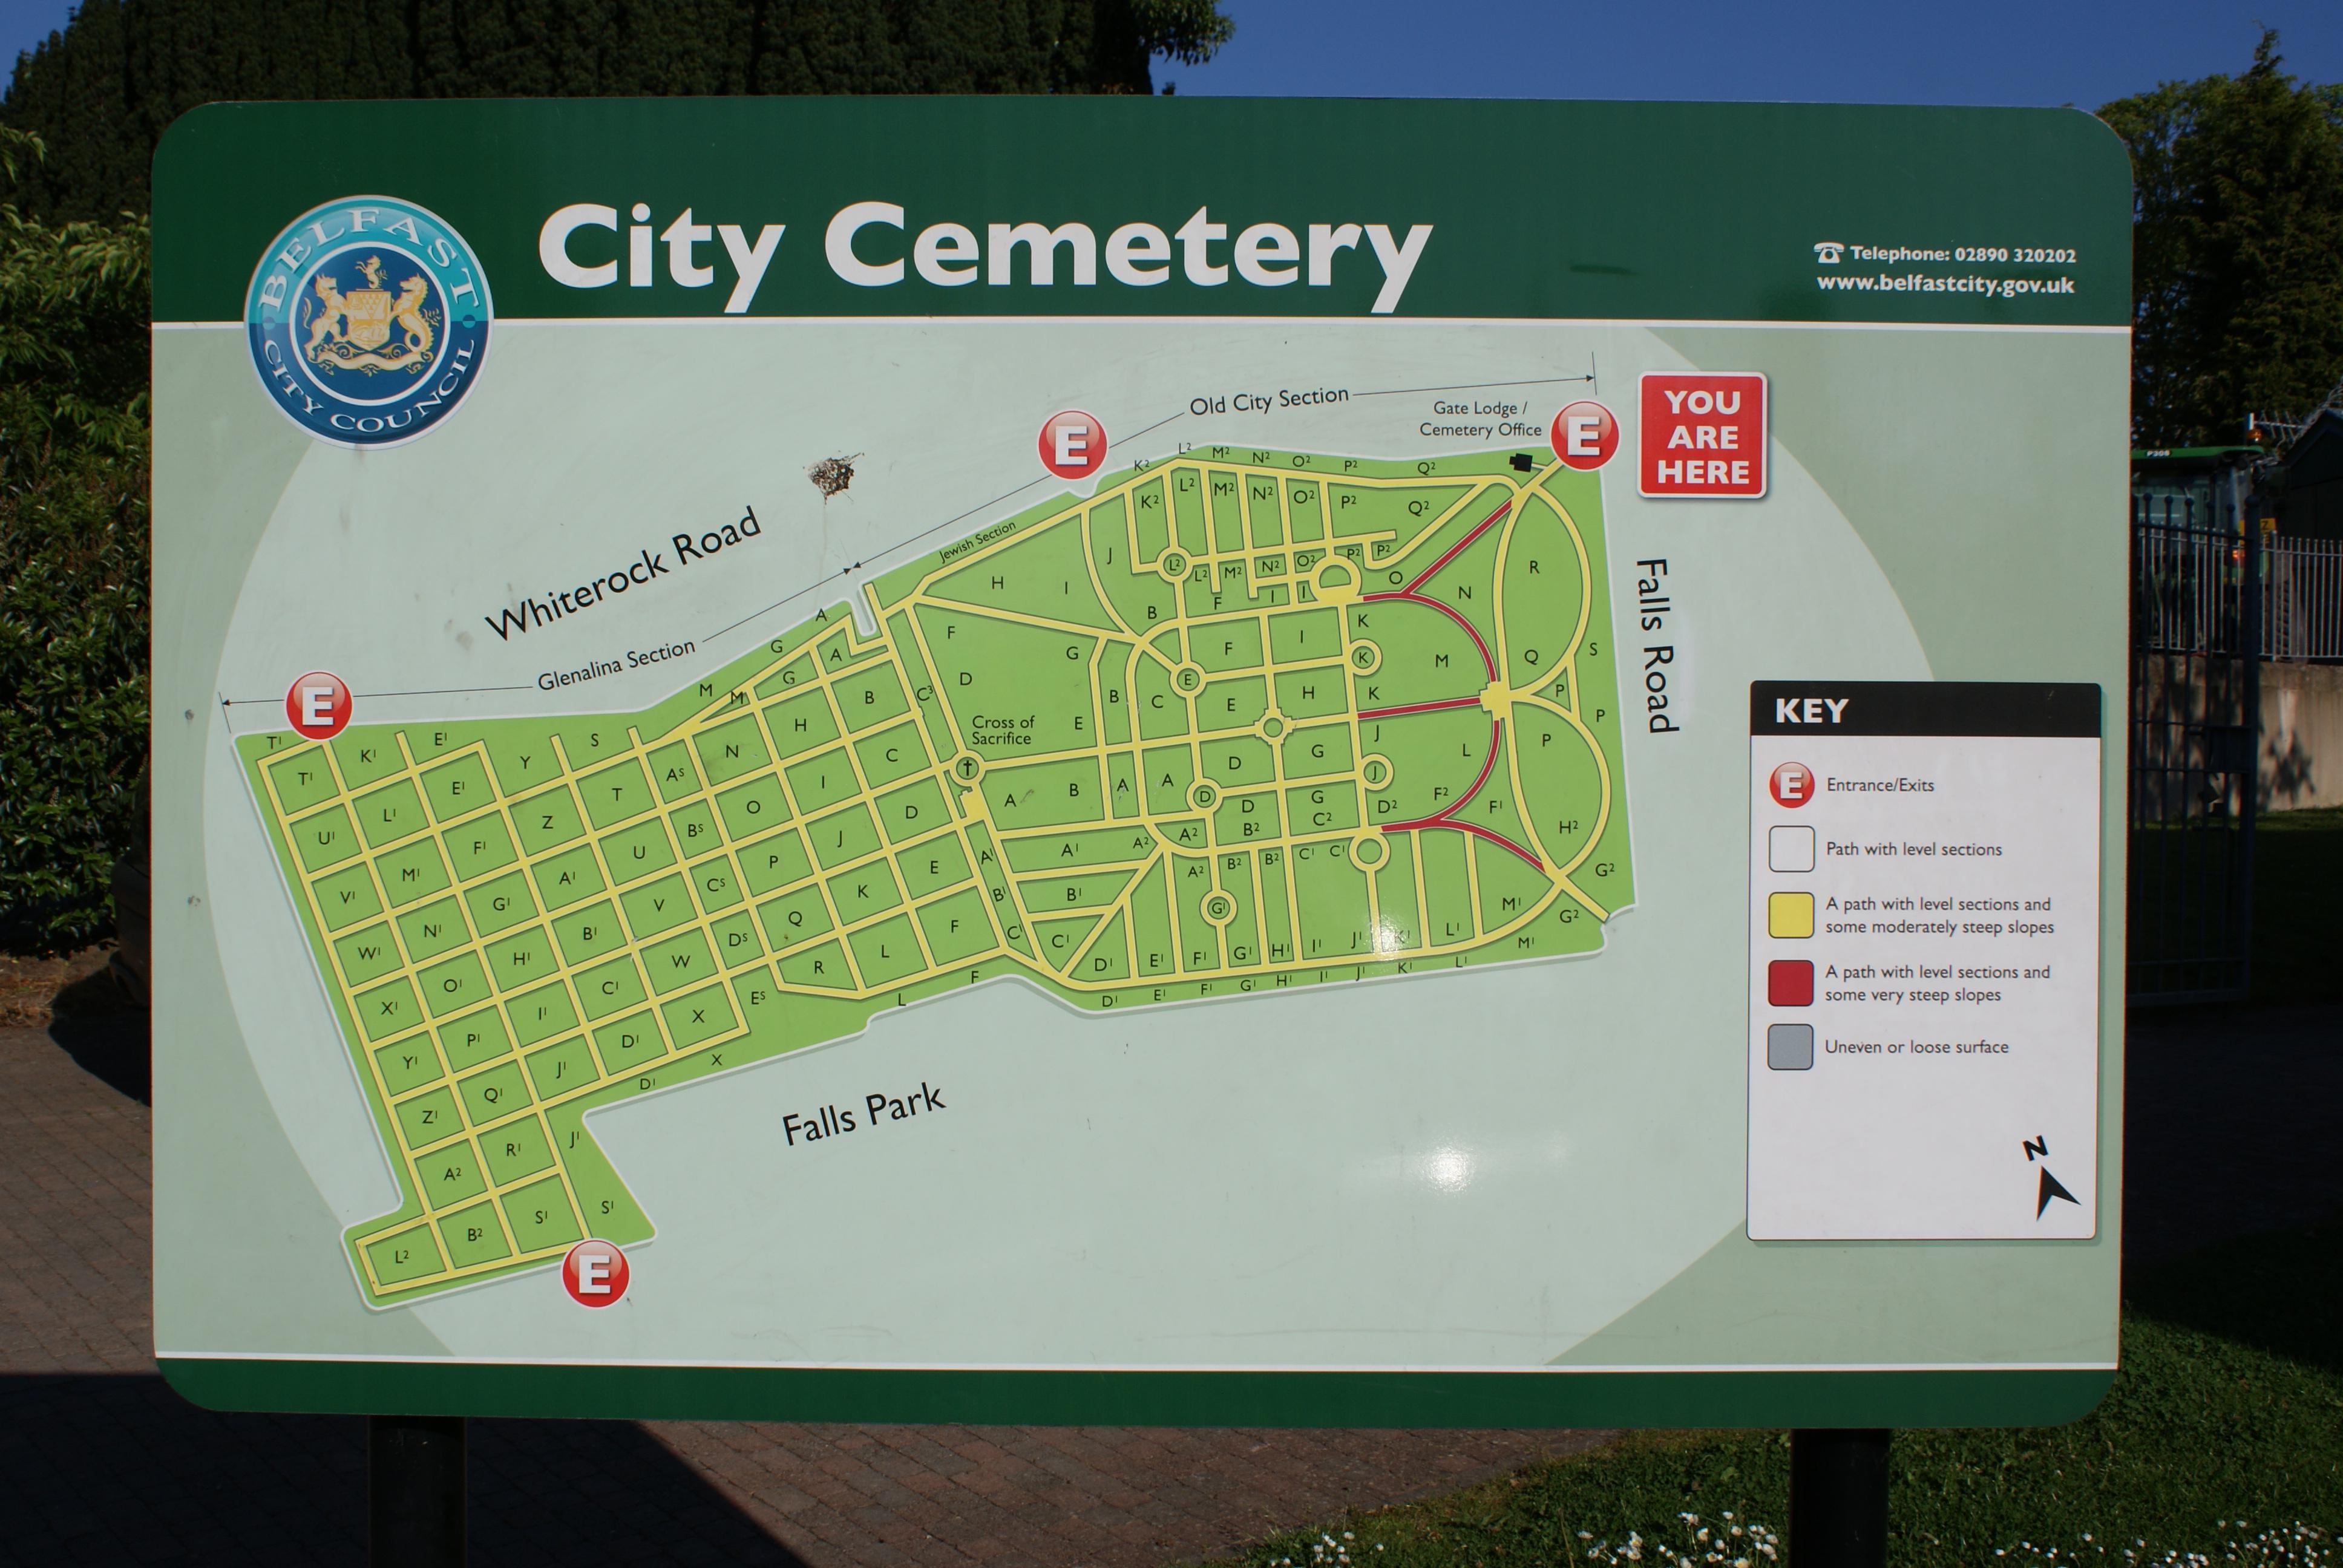 Belfast City Cemetery in Belfast, County Antrim - Find A ... on goteborg city map, erfurt city map, ellsworth city map, cuenca city map, limassol city map, solitude city map, rijeka city map, a coruna city map, bolivar city map, waterville city map, delray beach city map, bulawayo city map, fortaleza city map, alma city map, santos city map, ennis city map, dingle city map, fife city map, pomeroy city map, yantai city map,